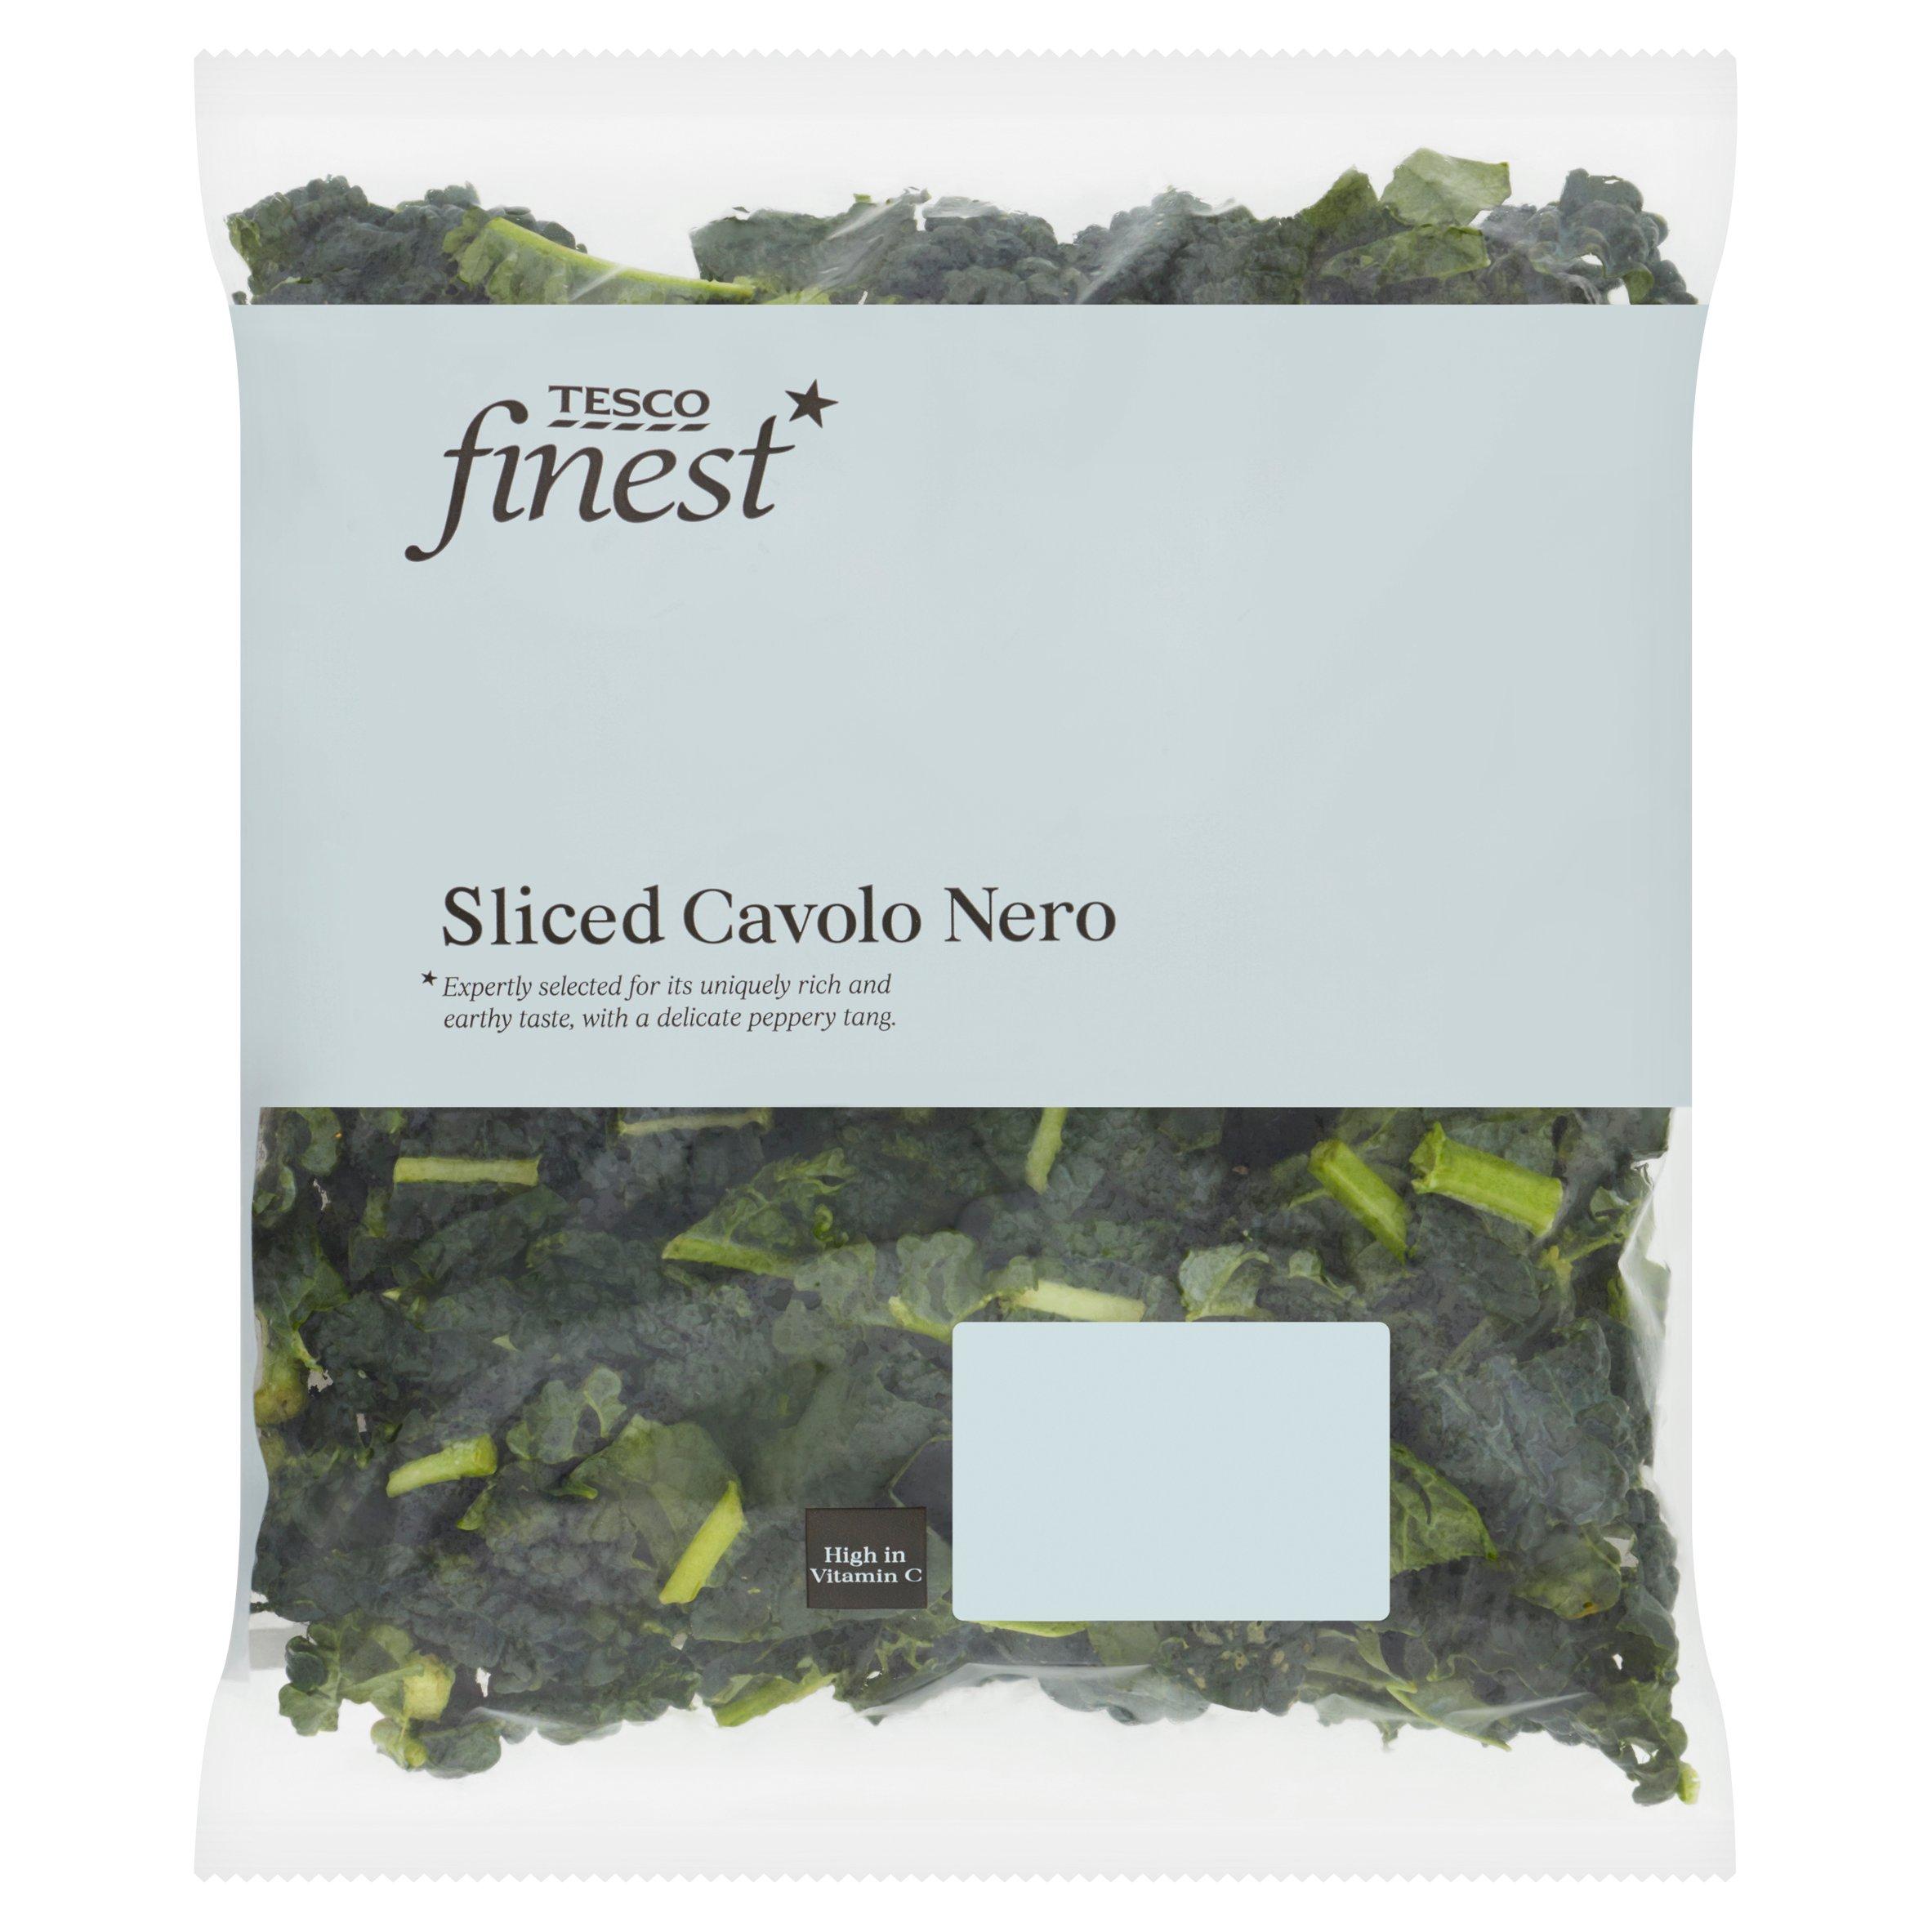 Tesco Finest Sliced Cavolo Nero 200G